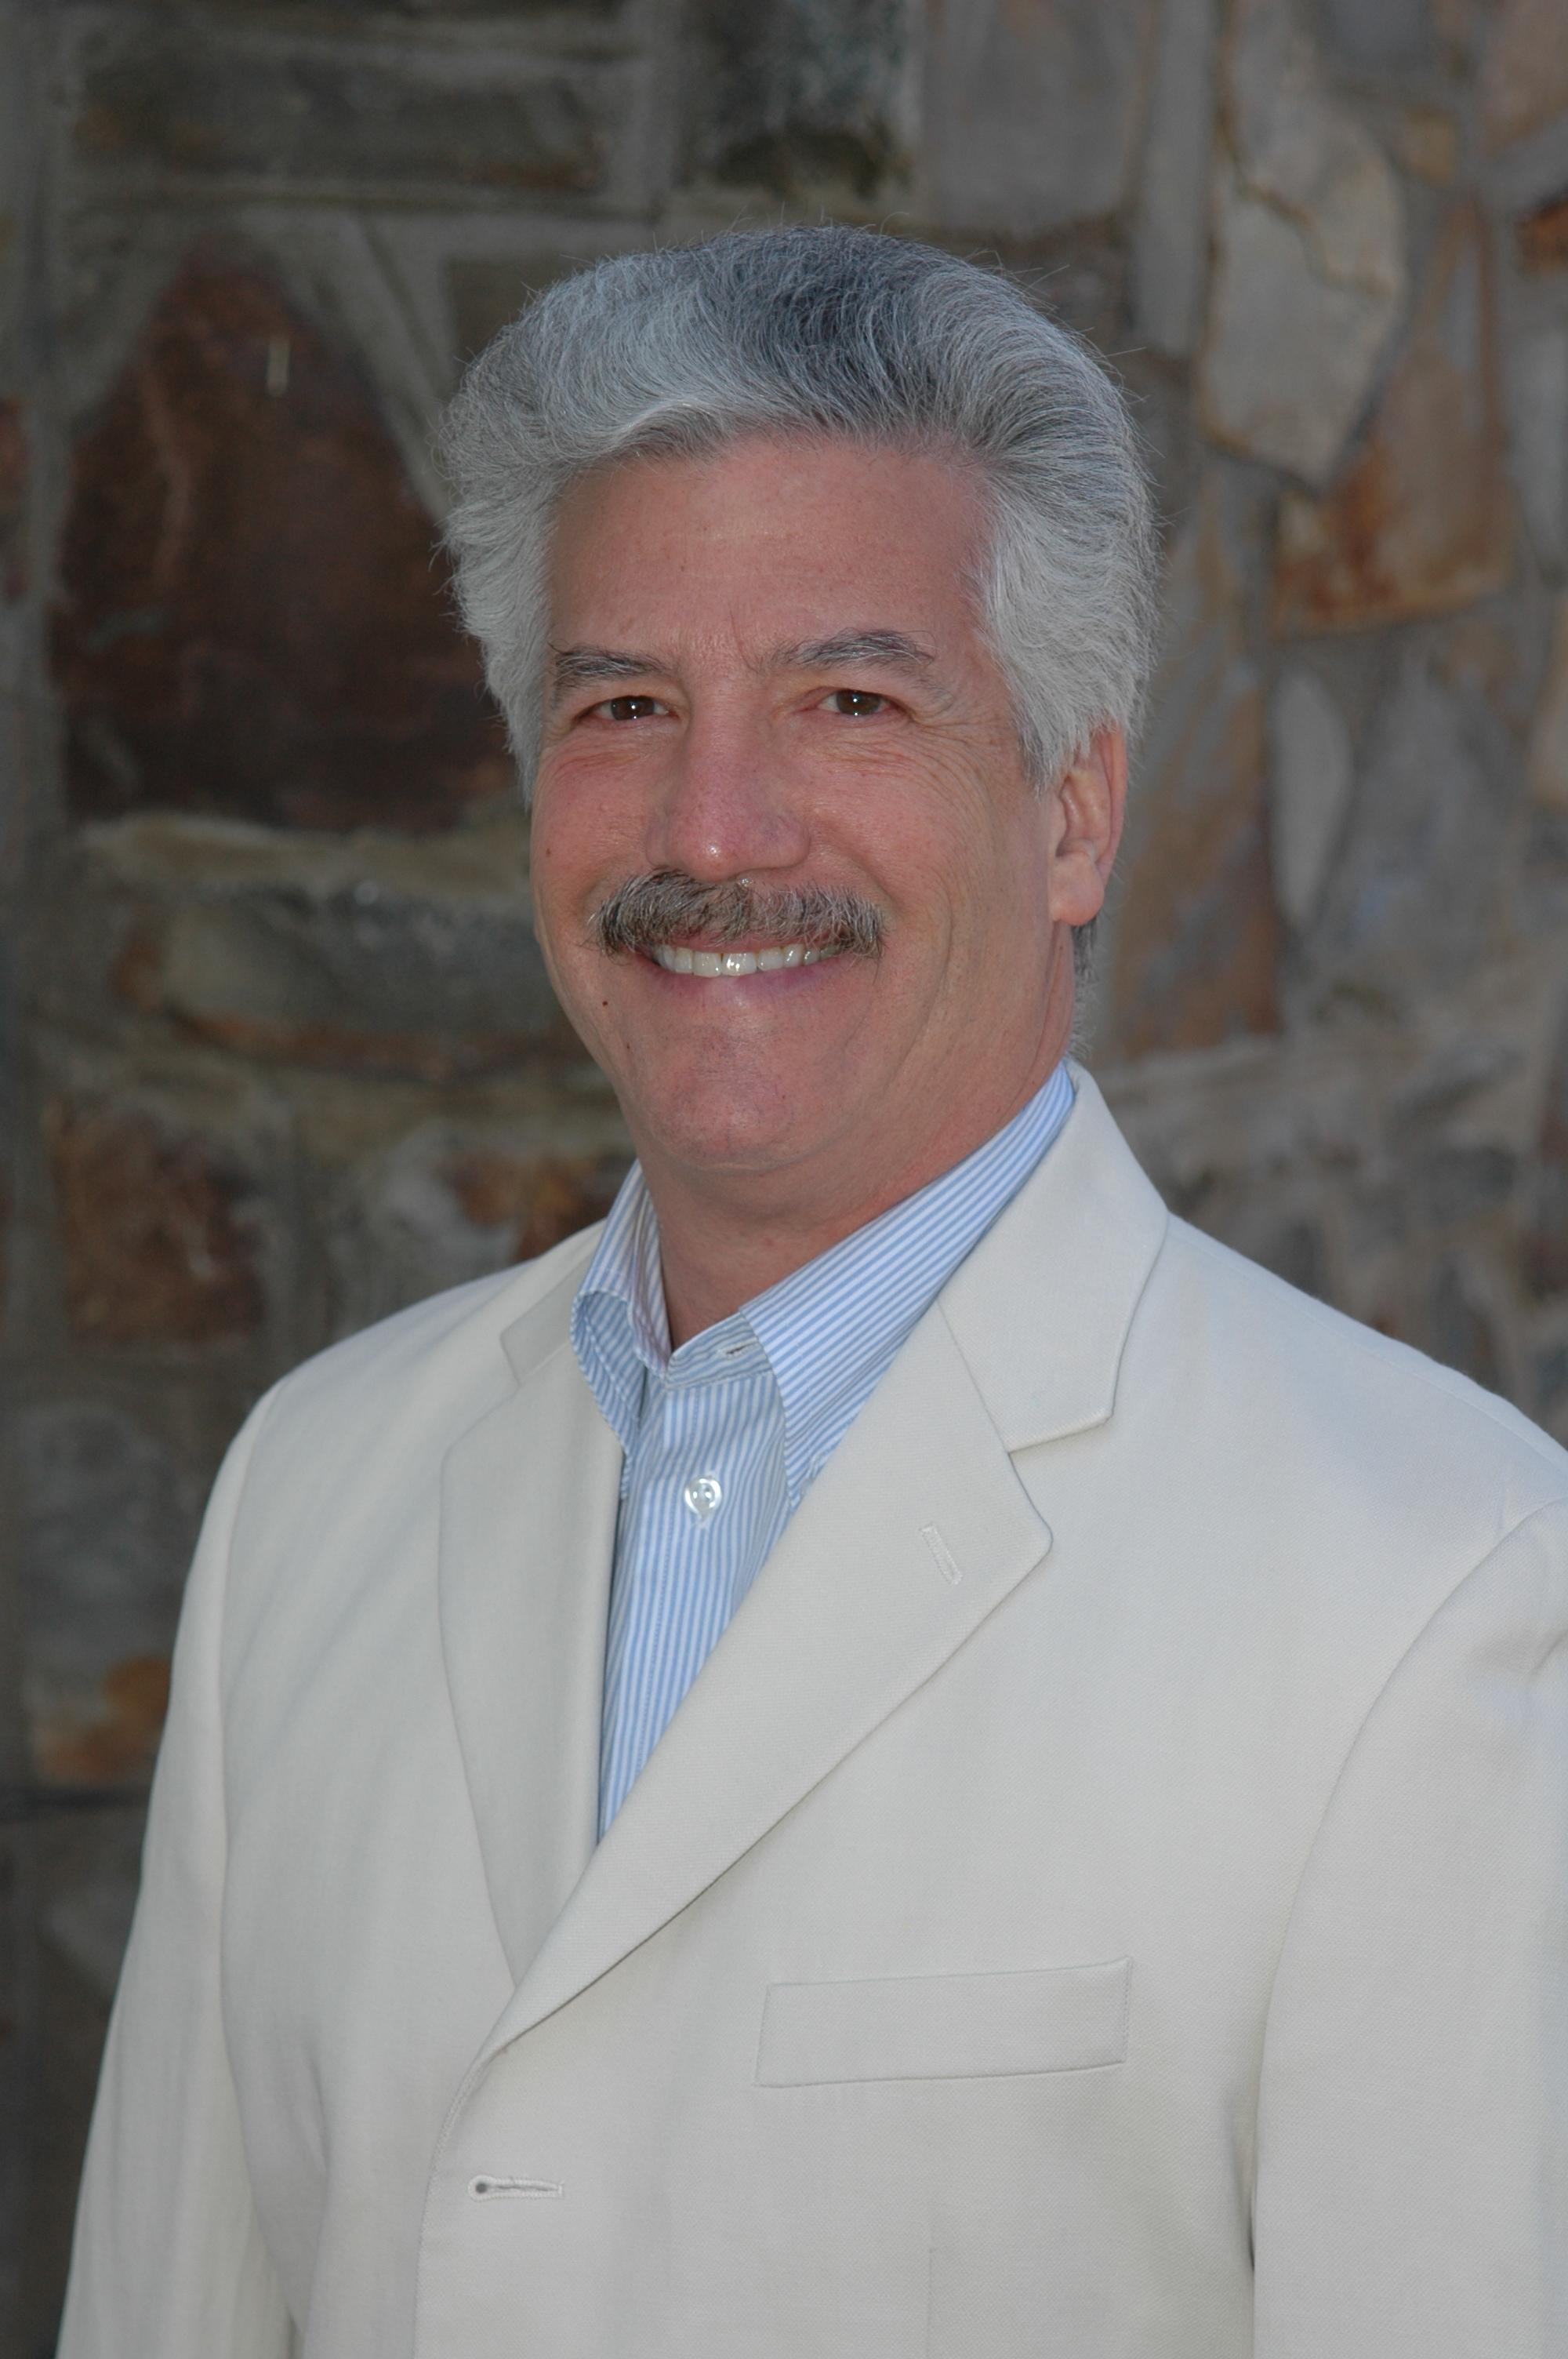 Allan G. Dosik